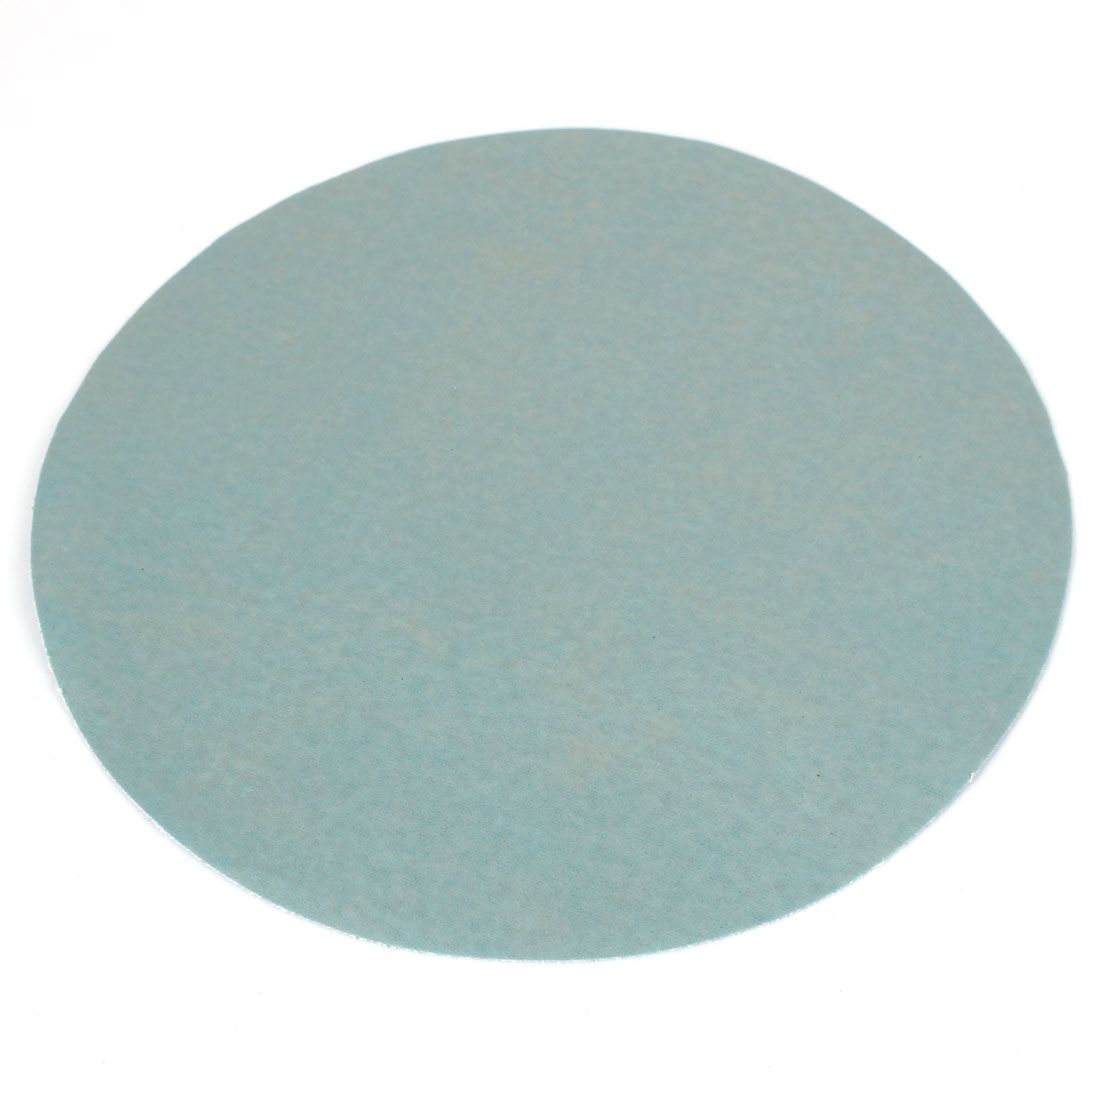 17cm Dia 7000 Grit Abrasive Polishing Hook and Loop Sanding Disc Light Green